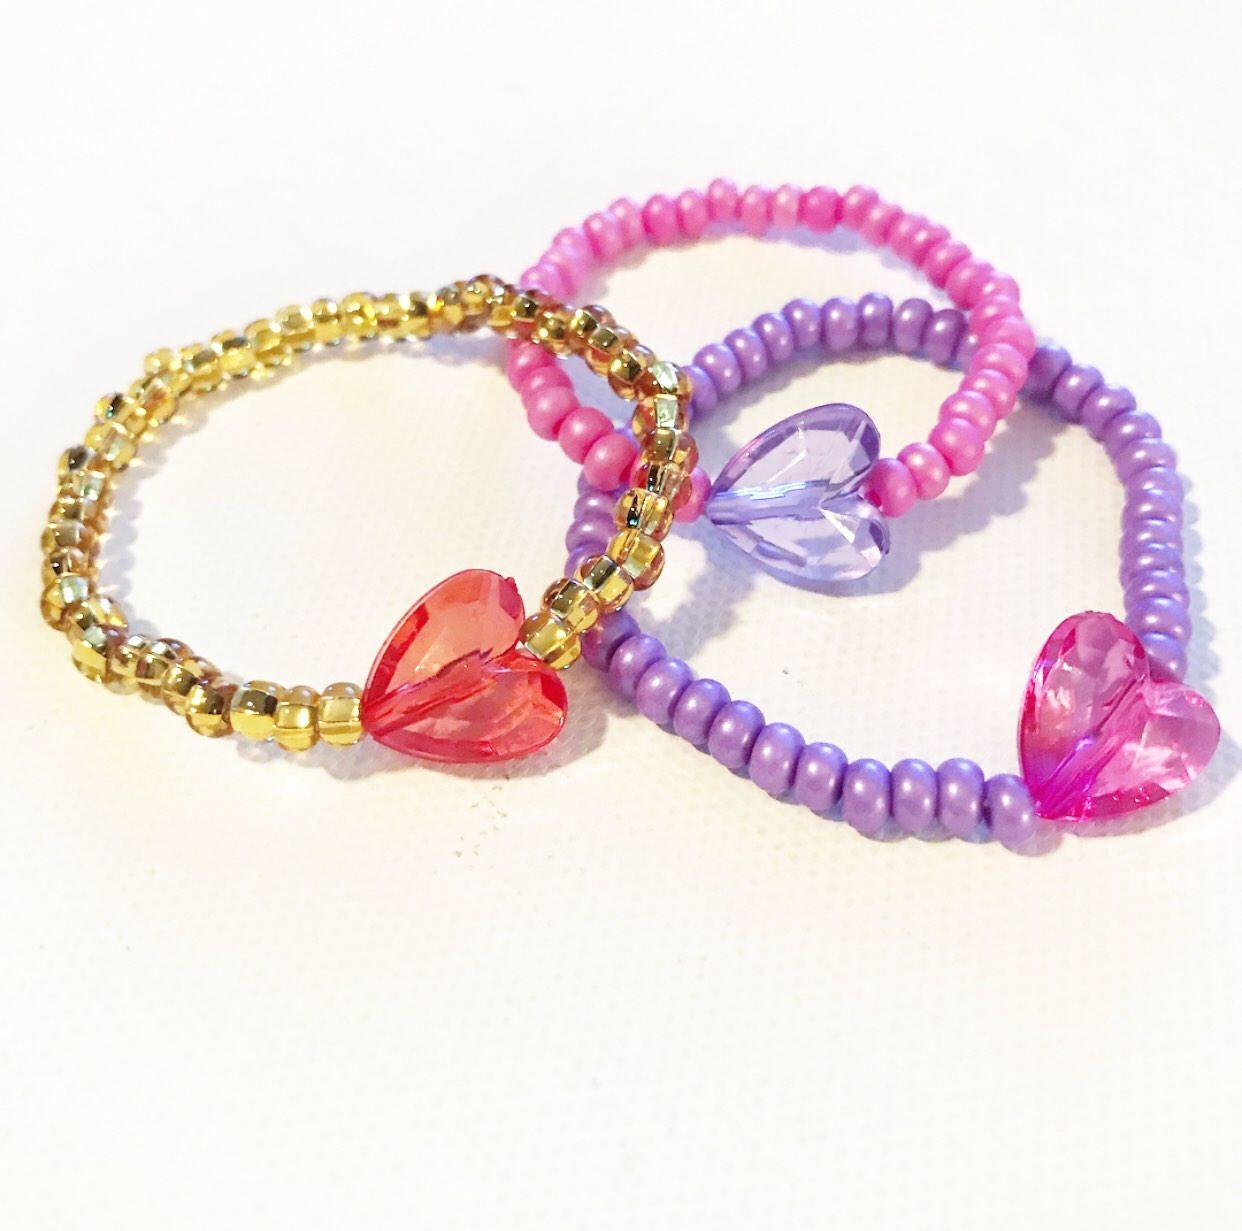 Toddler jewelry for girls girls friendship bracelets kids